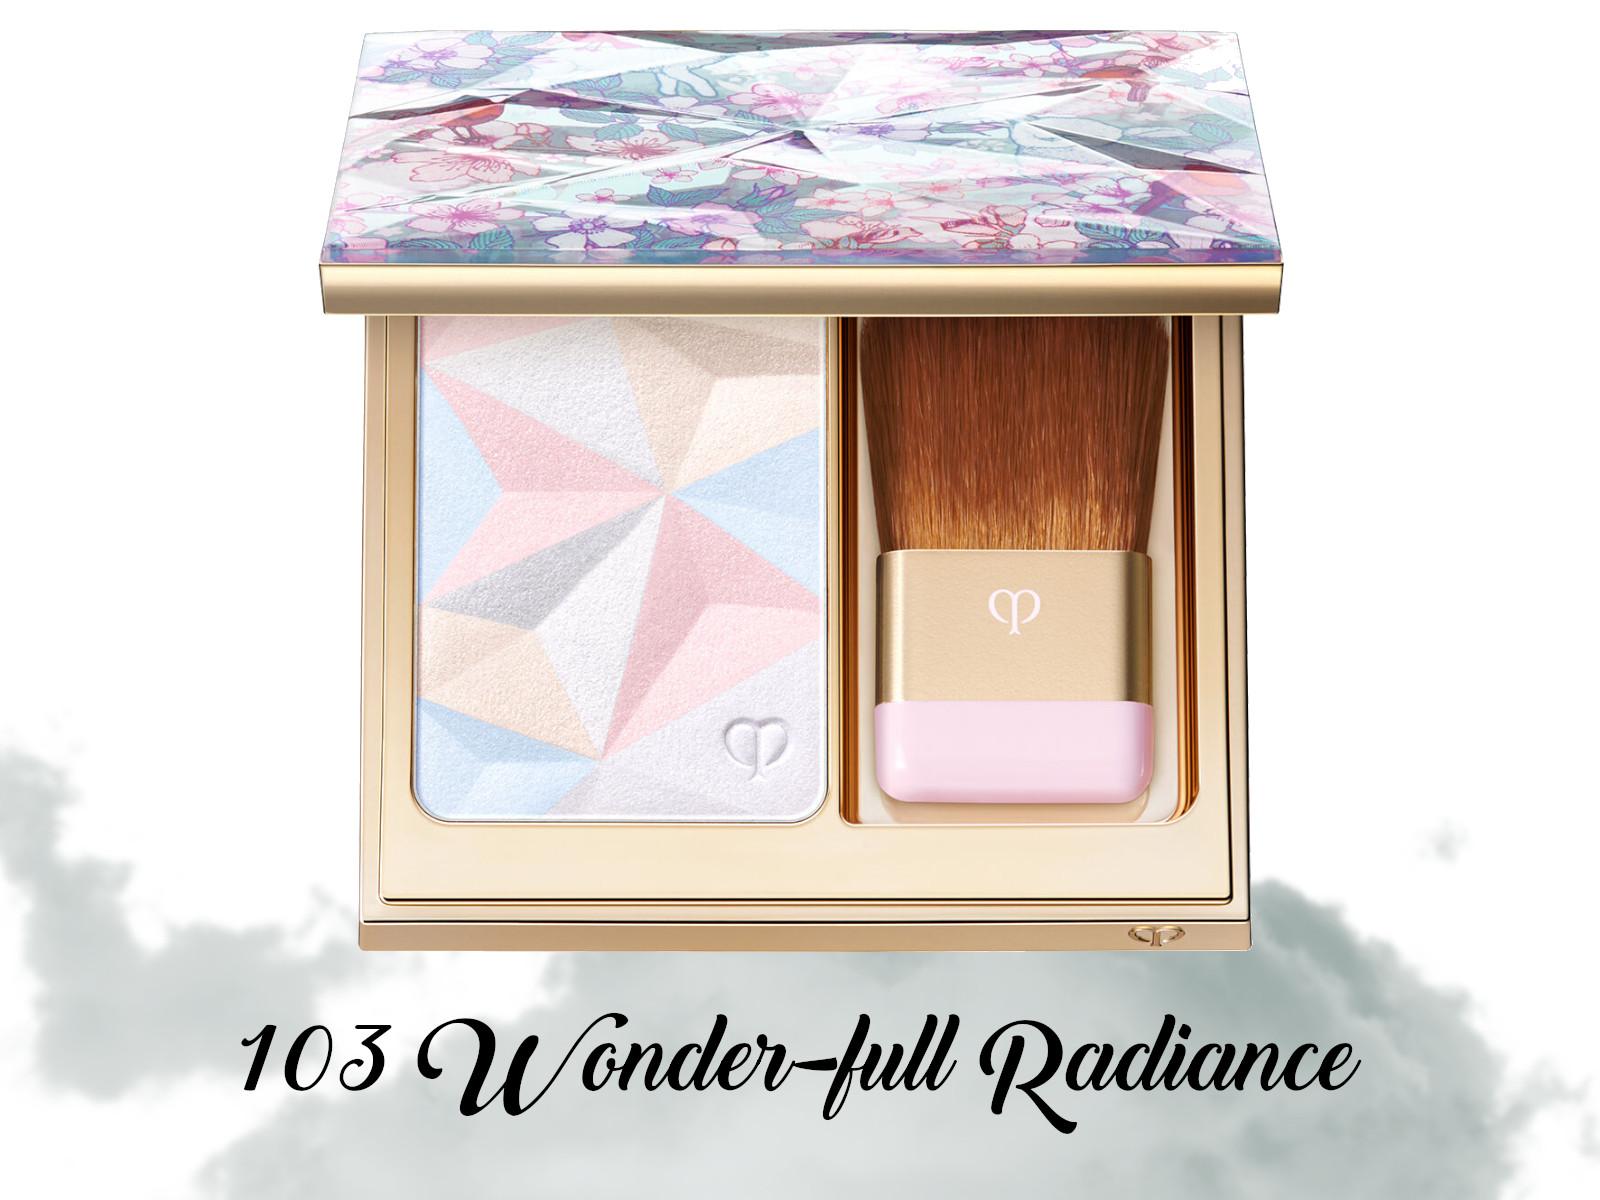 Cle de Peau Beauty Garden Of Splendor Rehausseur D'Eclat 103 Wonder-full Radiance